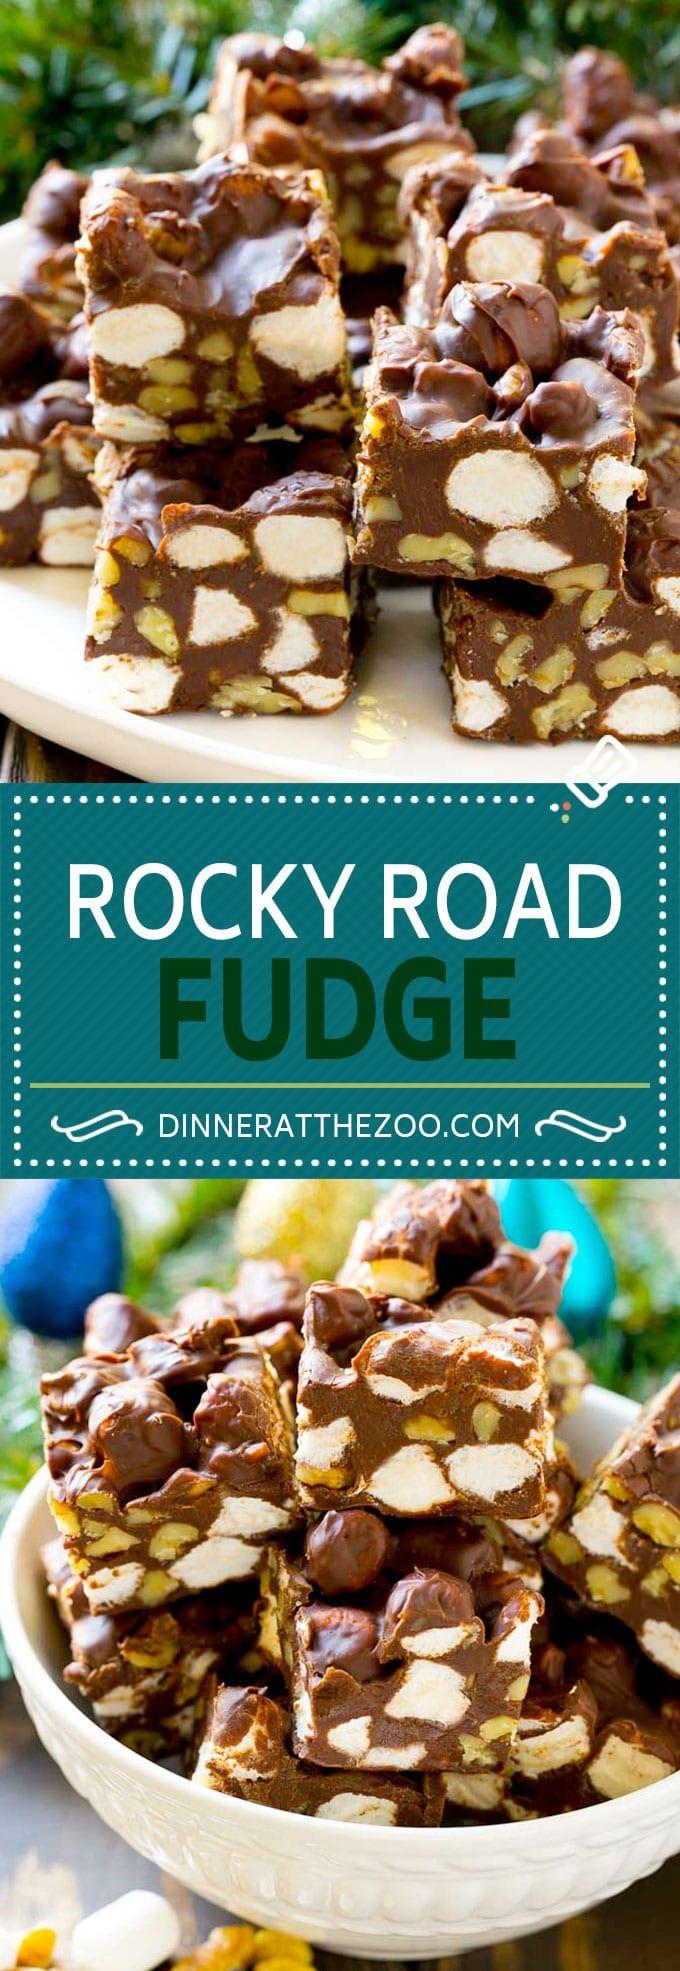 Rocky Road Fudge   Chocolate Marshmallow Fudge   Chocolate Nut Fudge   Microwave Fudge